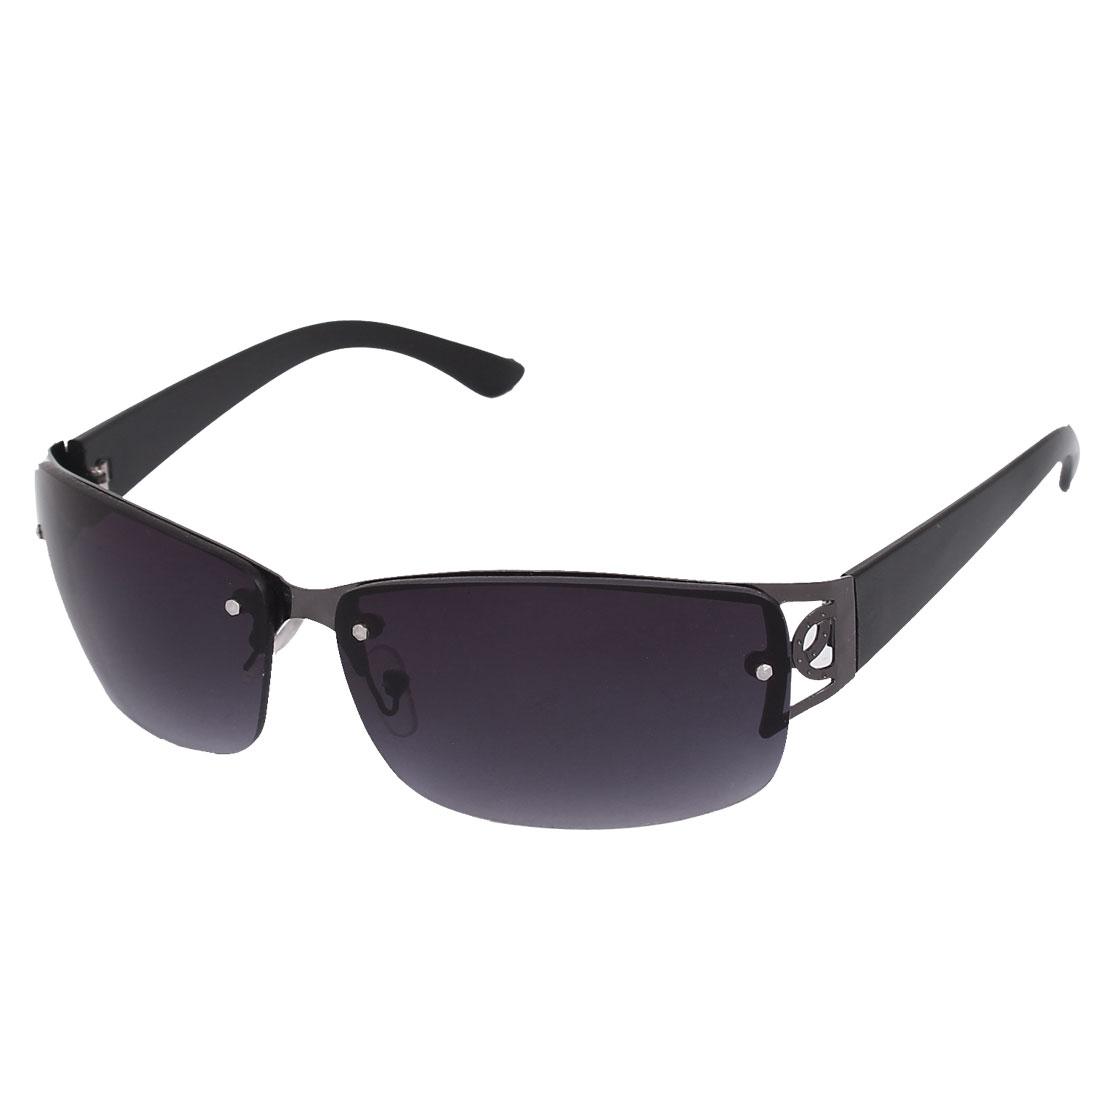 Men Rectangle Frame Half Rimless Single Bridge Sunglasses Glasses Eyewear Eyes Protecter Black